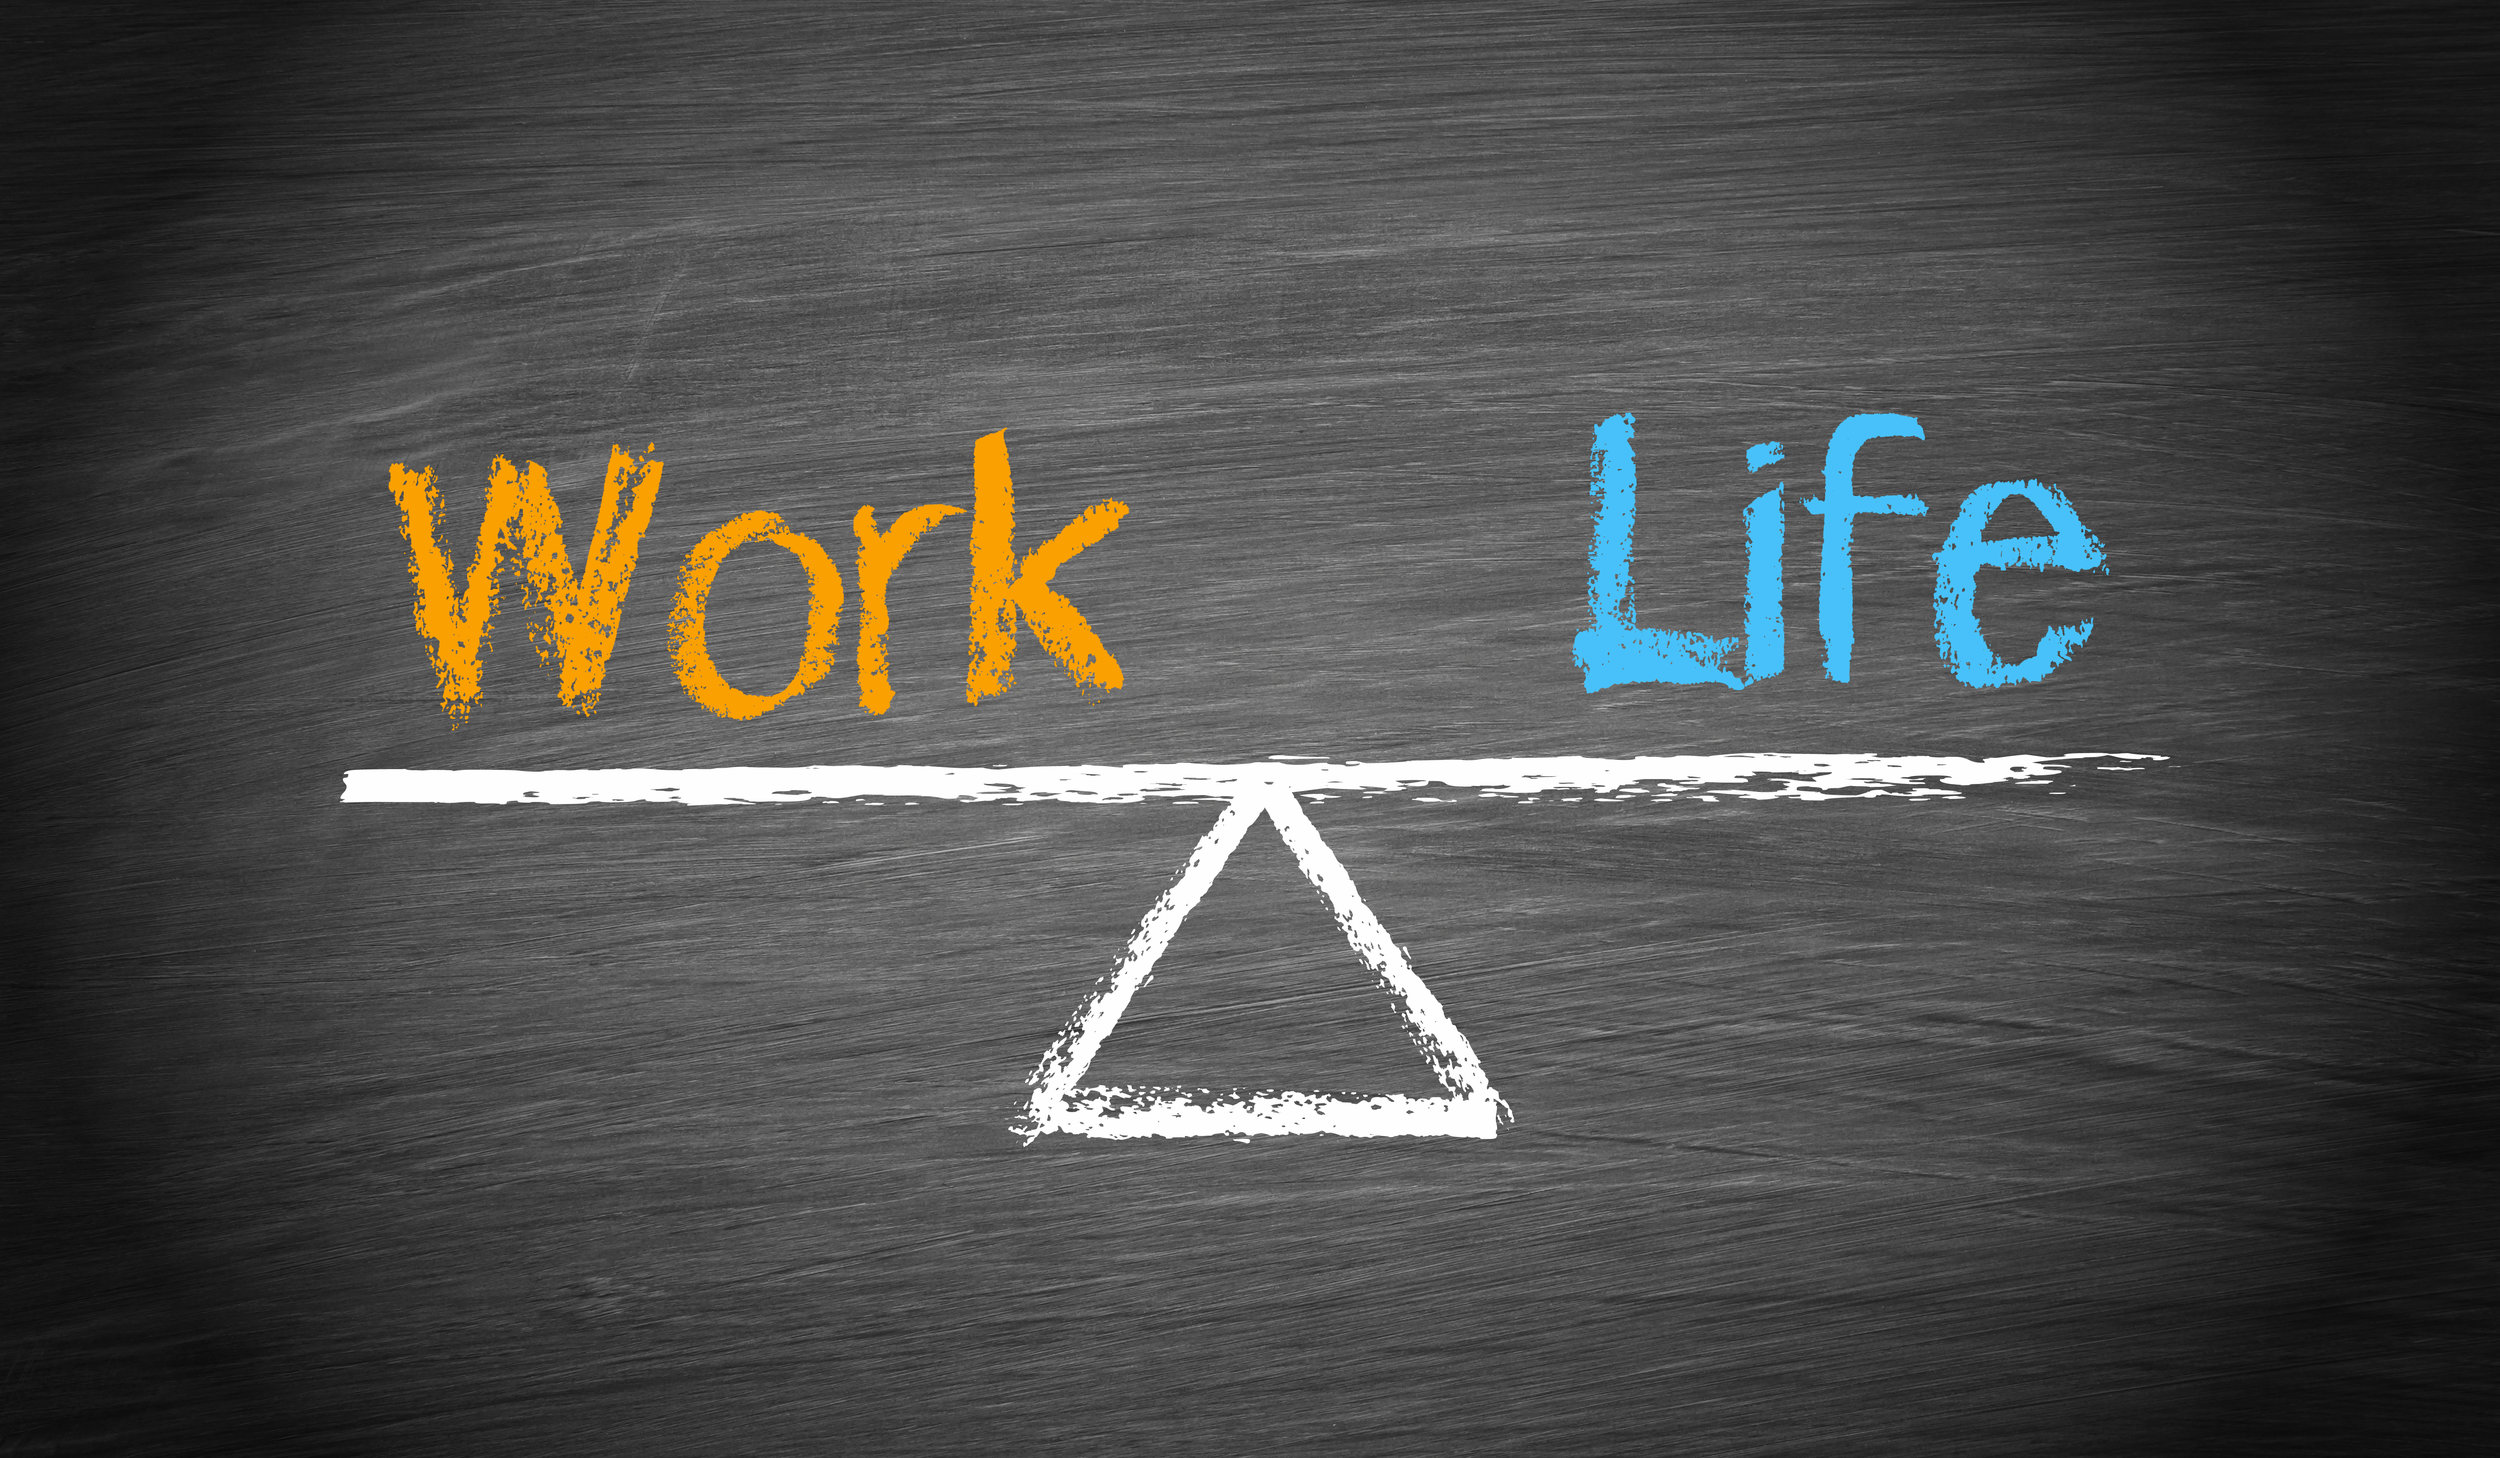 balanceworklife.jpg